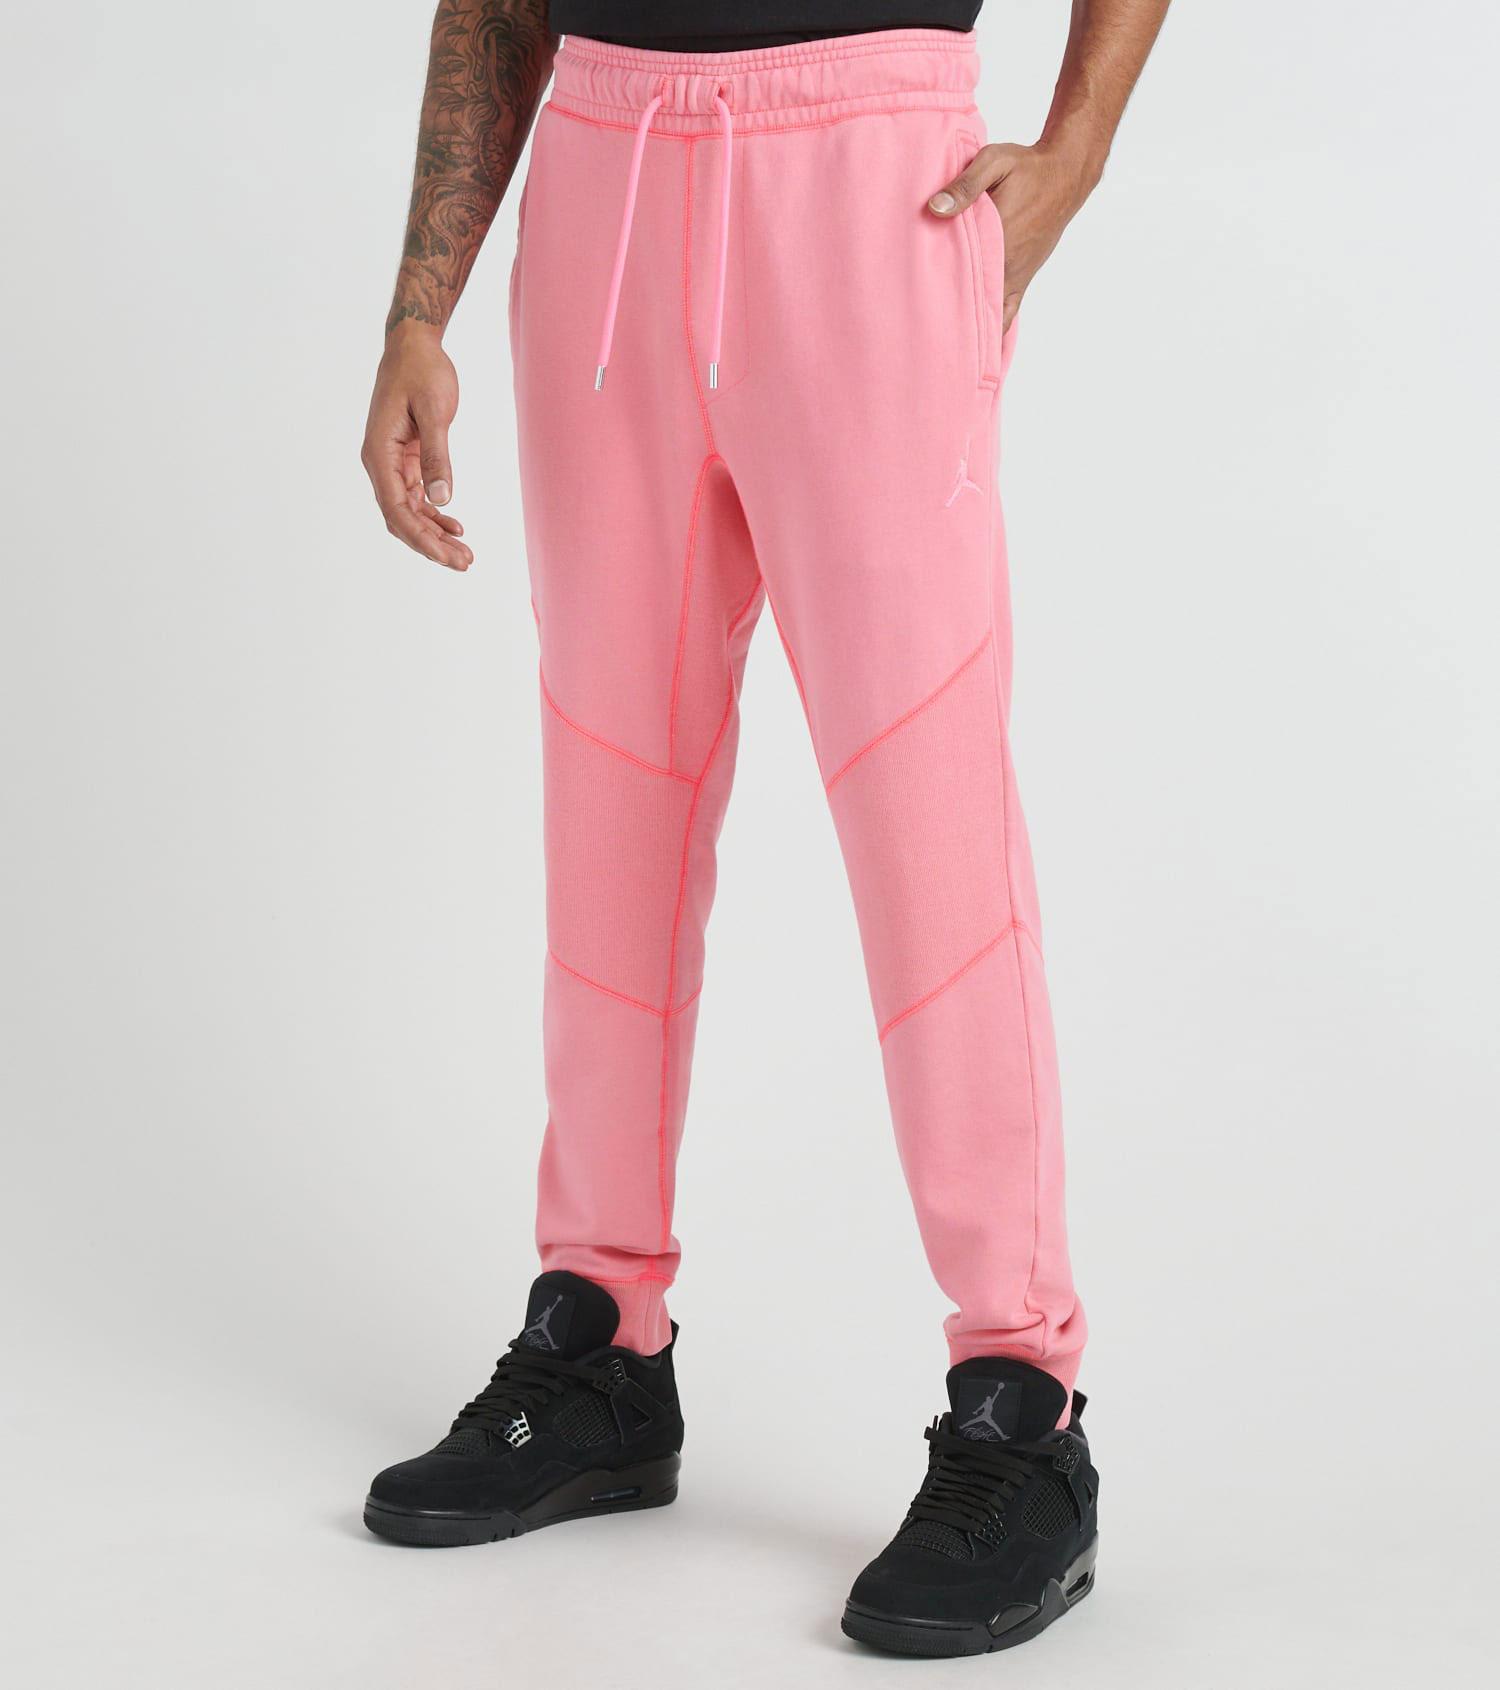 jordan-pink-jogger-pants-1